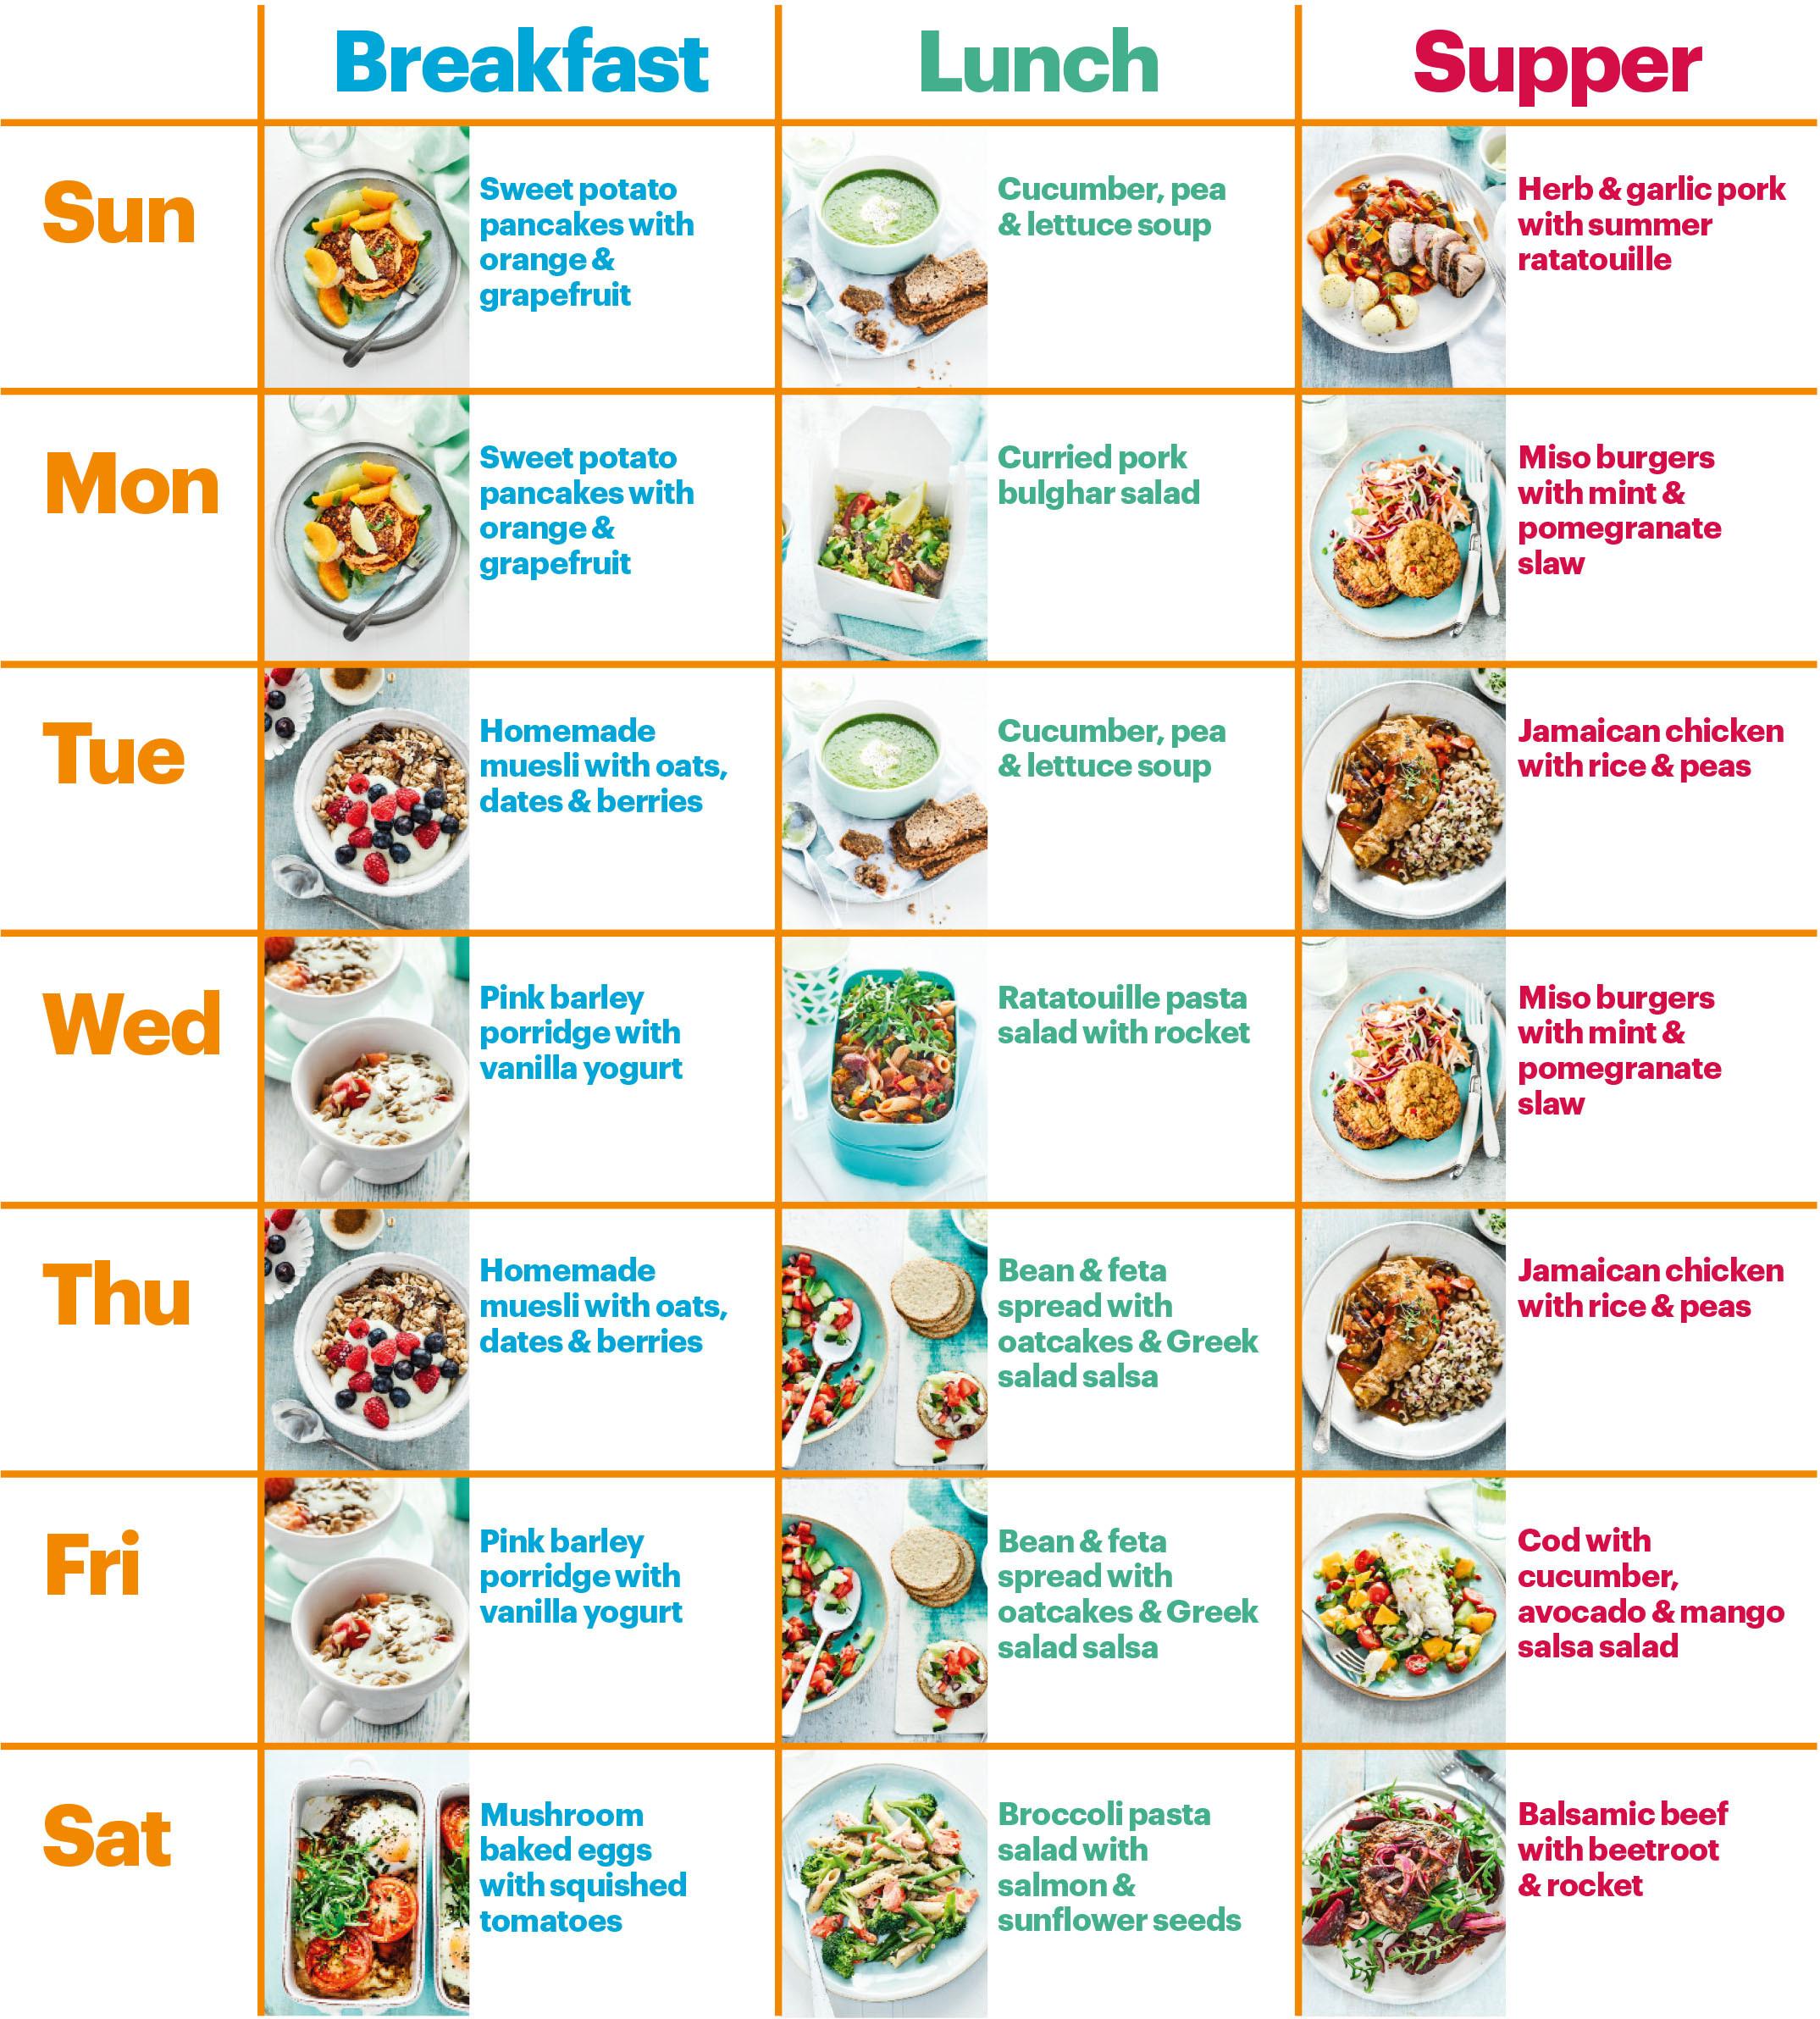 Heart Healthy Breakfast Menu  Healthy Breakfast Lunch And Dinner Chart Diet Plan Summer